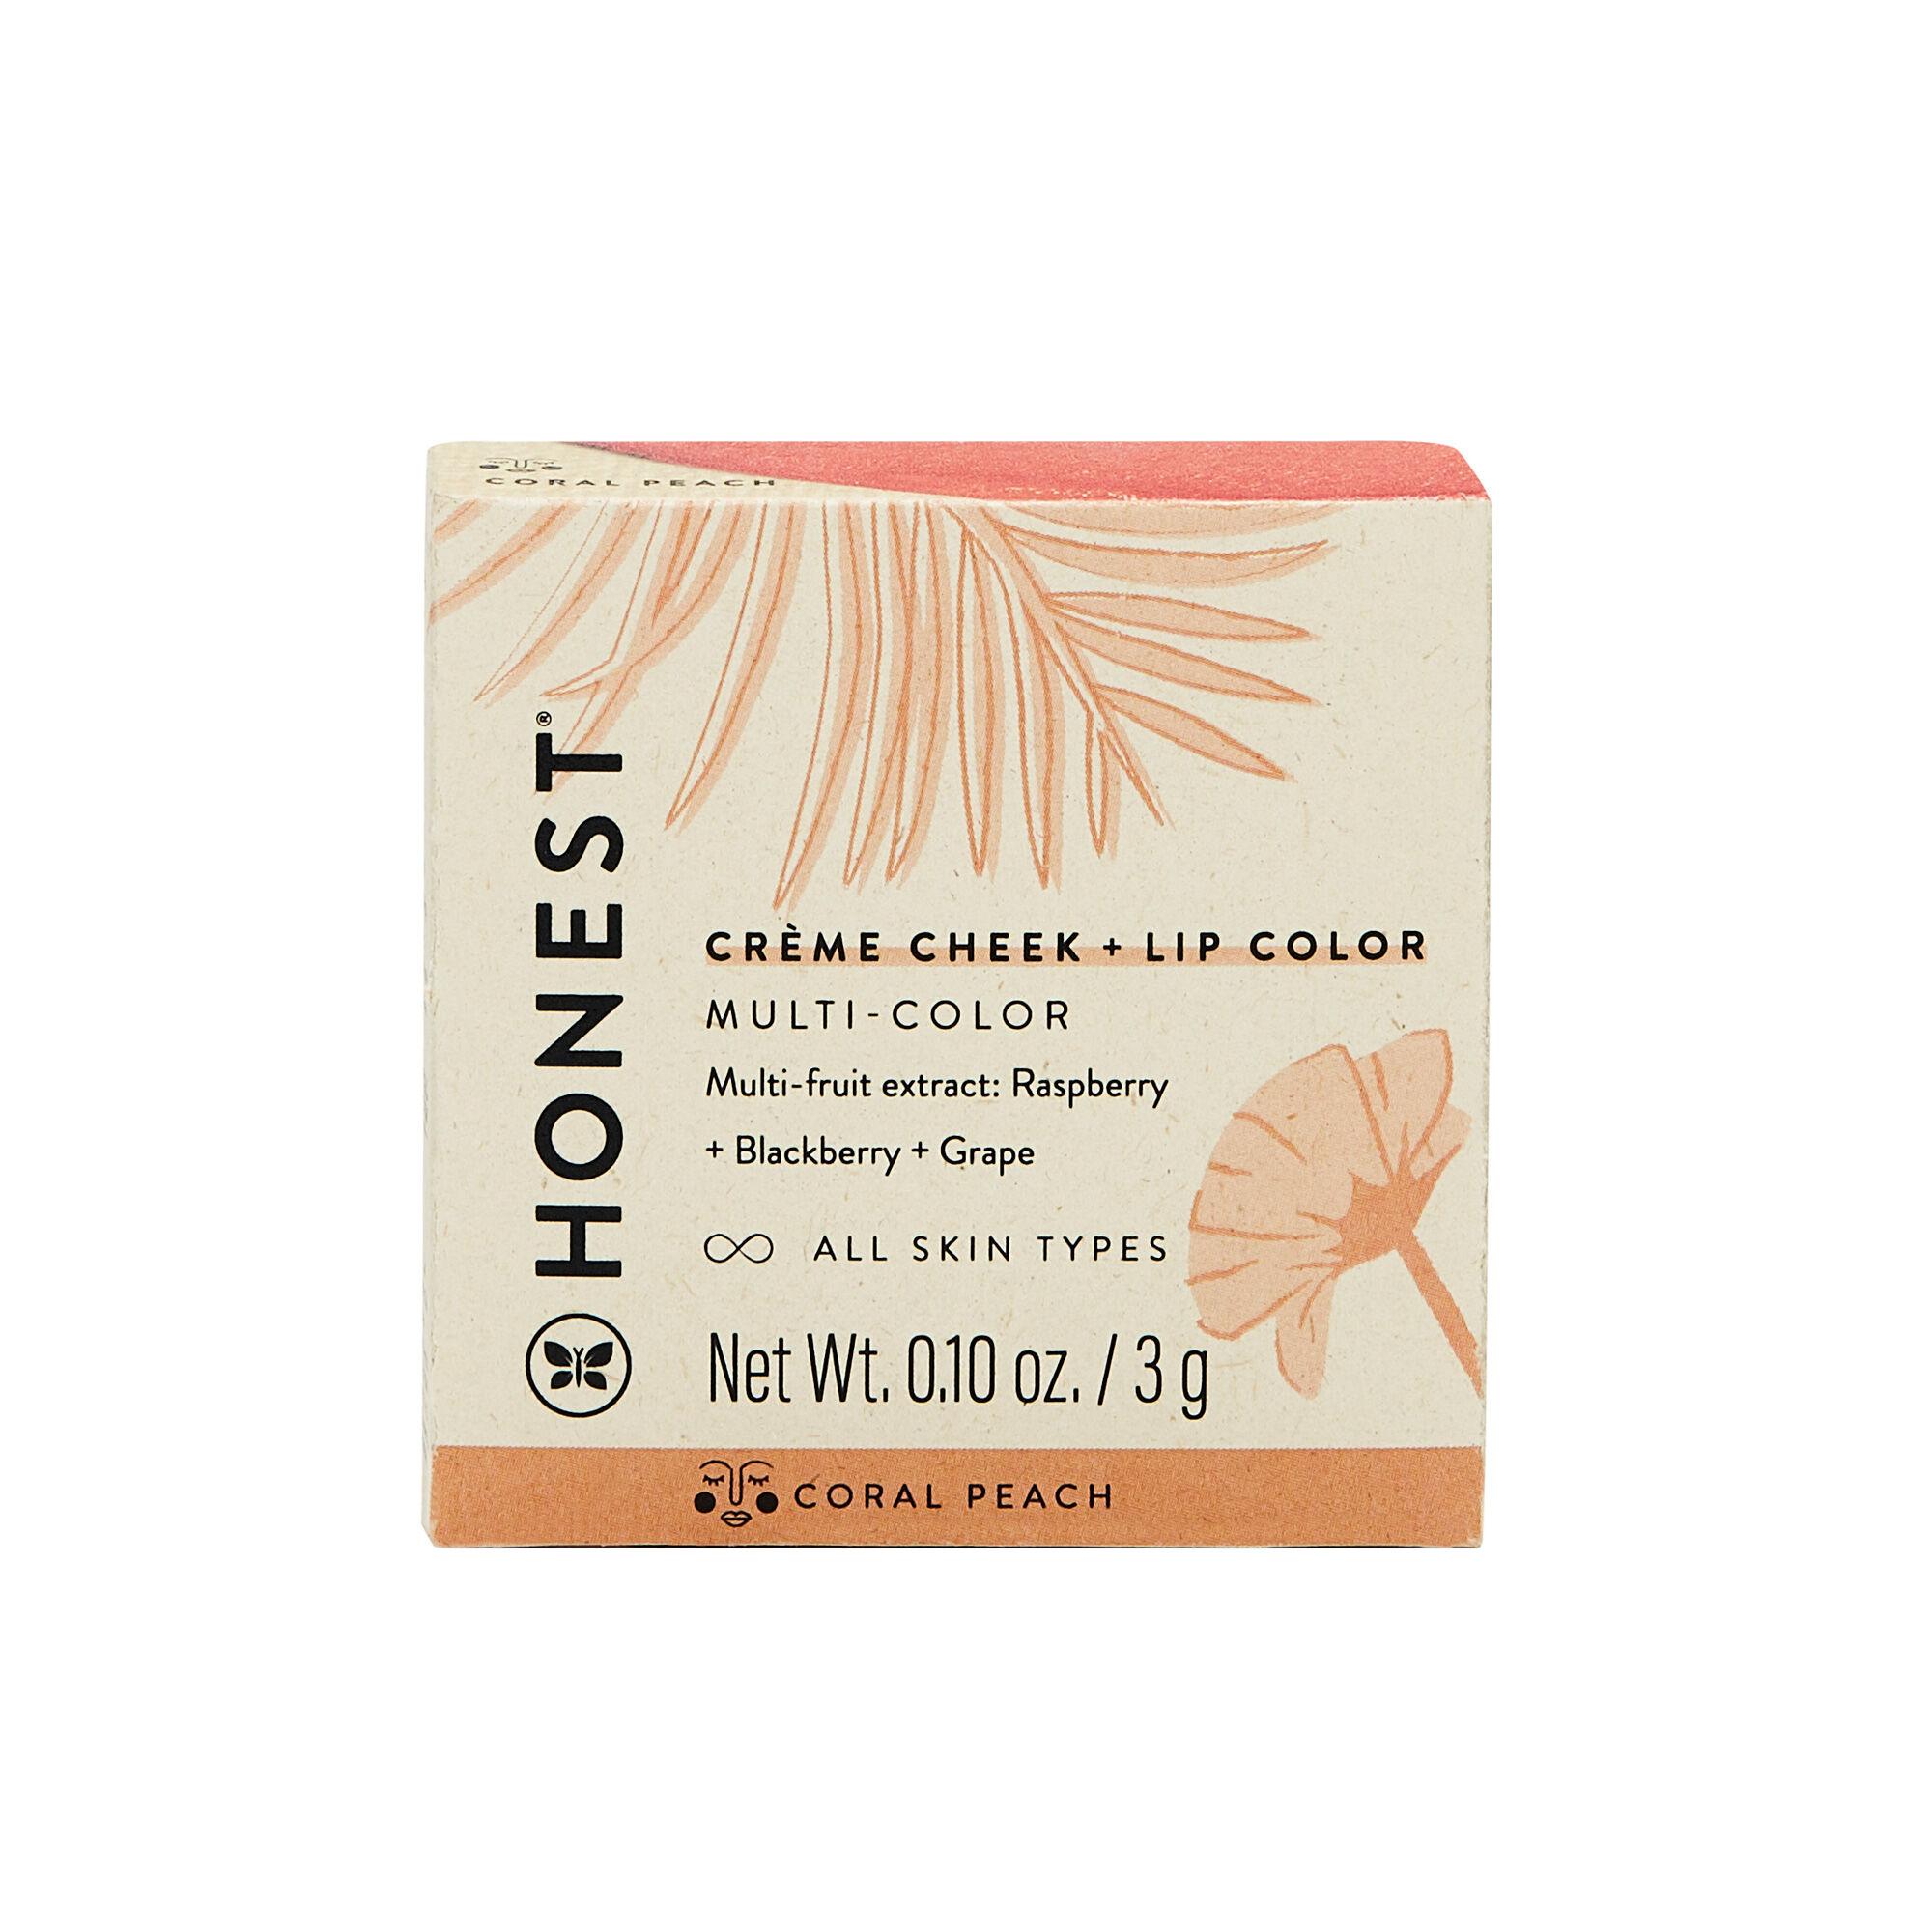 Creme Cheek + Lip Color, Coral Peach